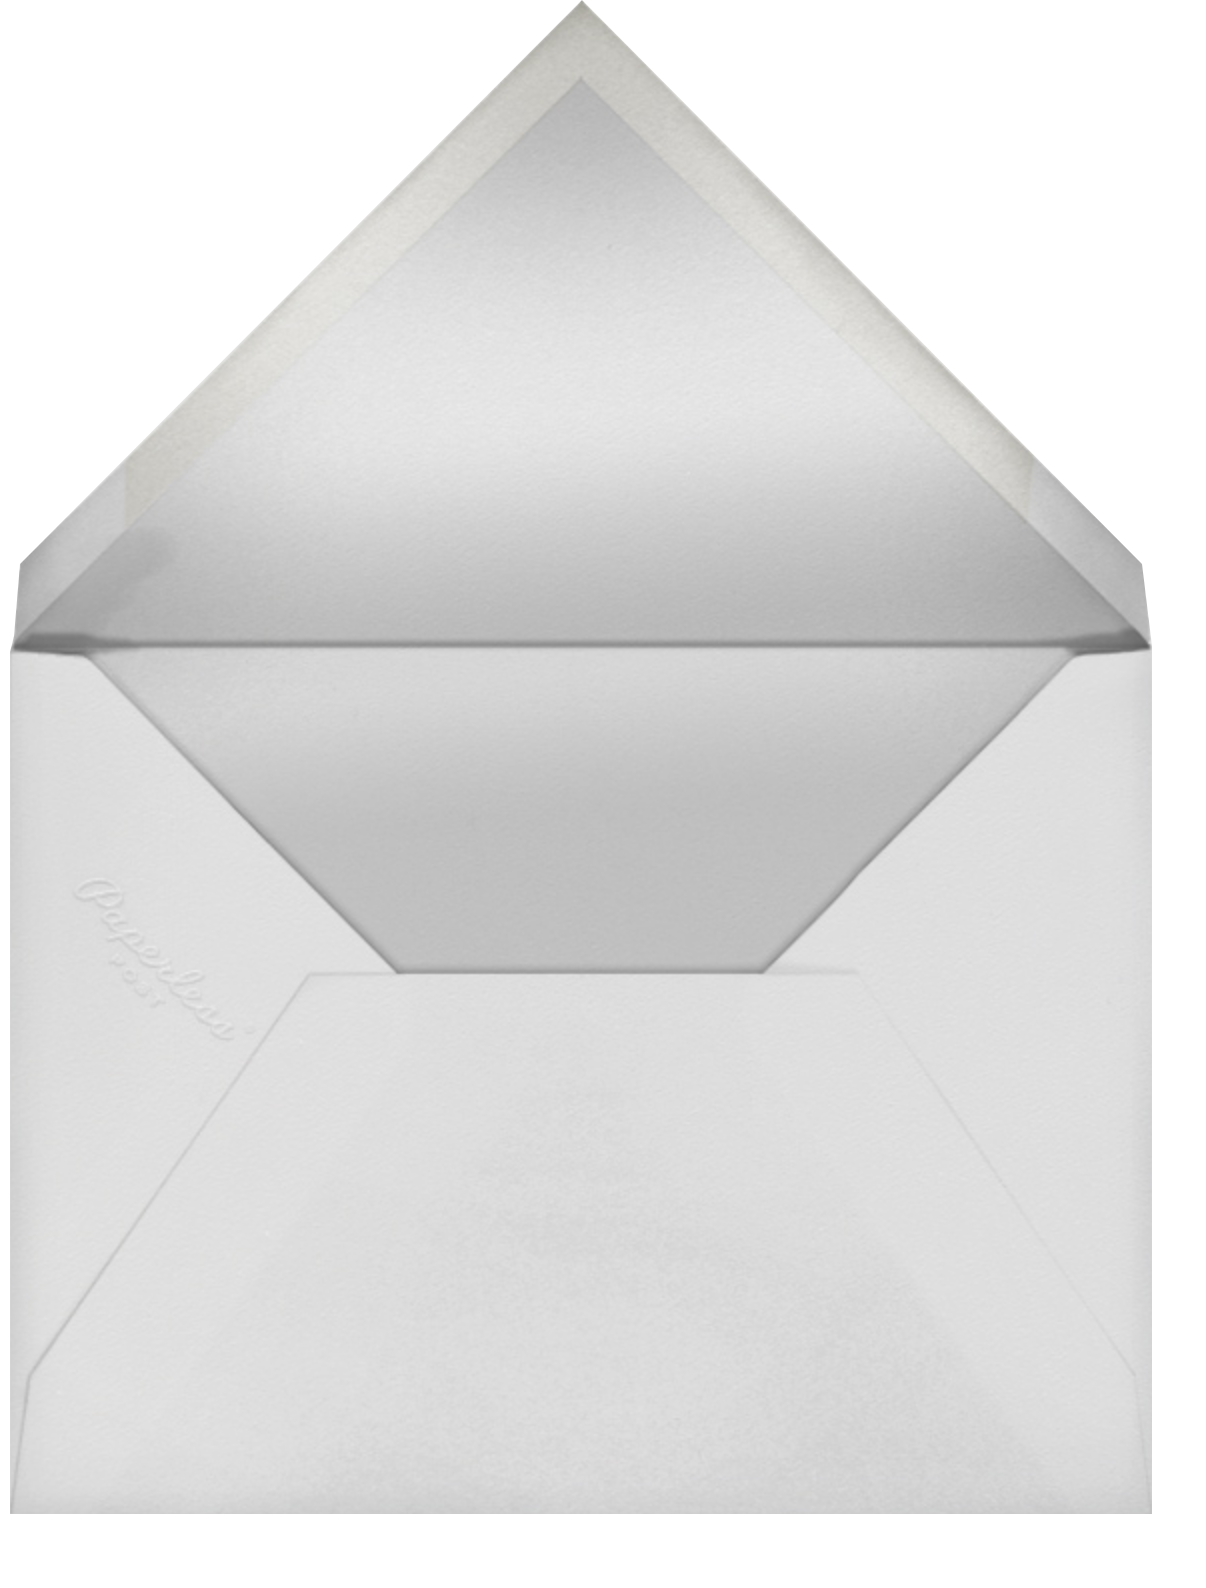 Fall Folk (Menu) - Rifle Paper Co. - Menus - envelope back